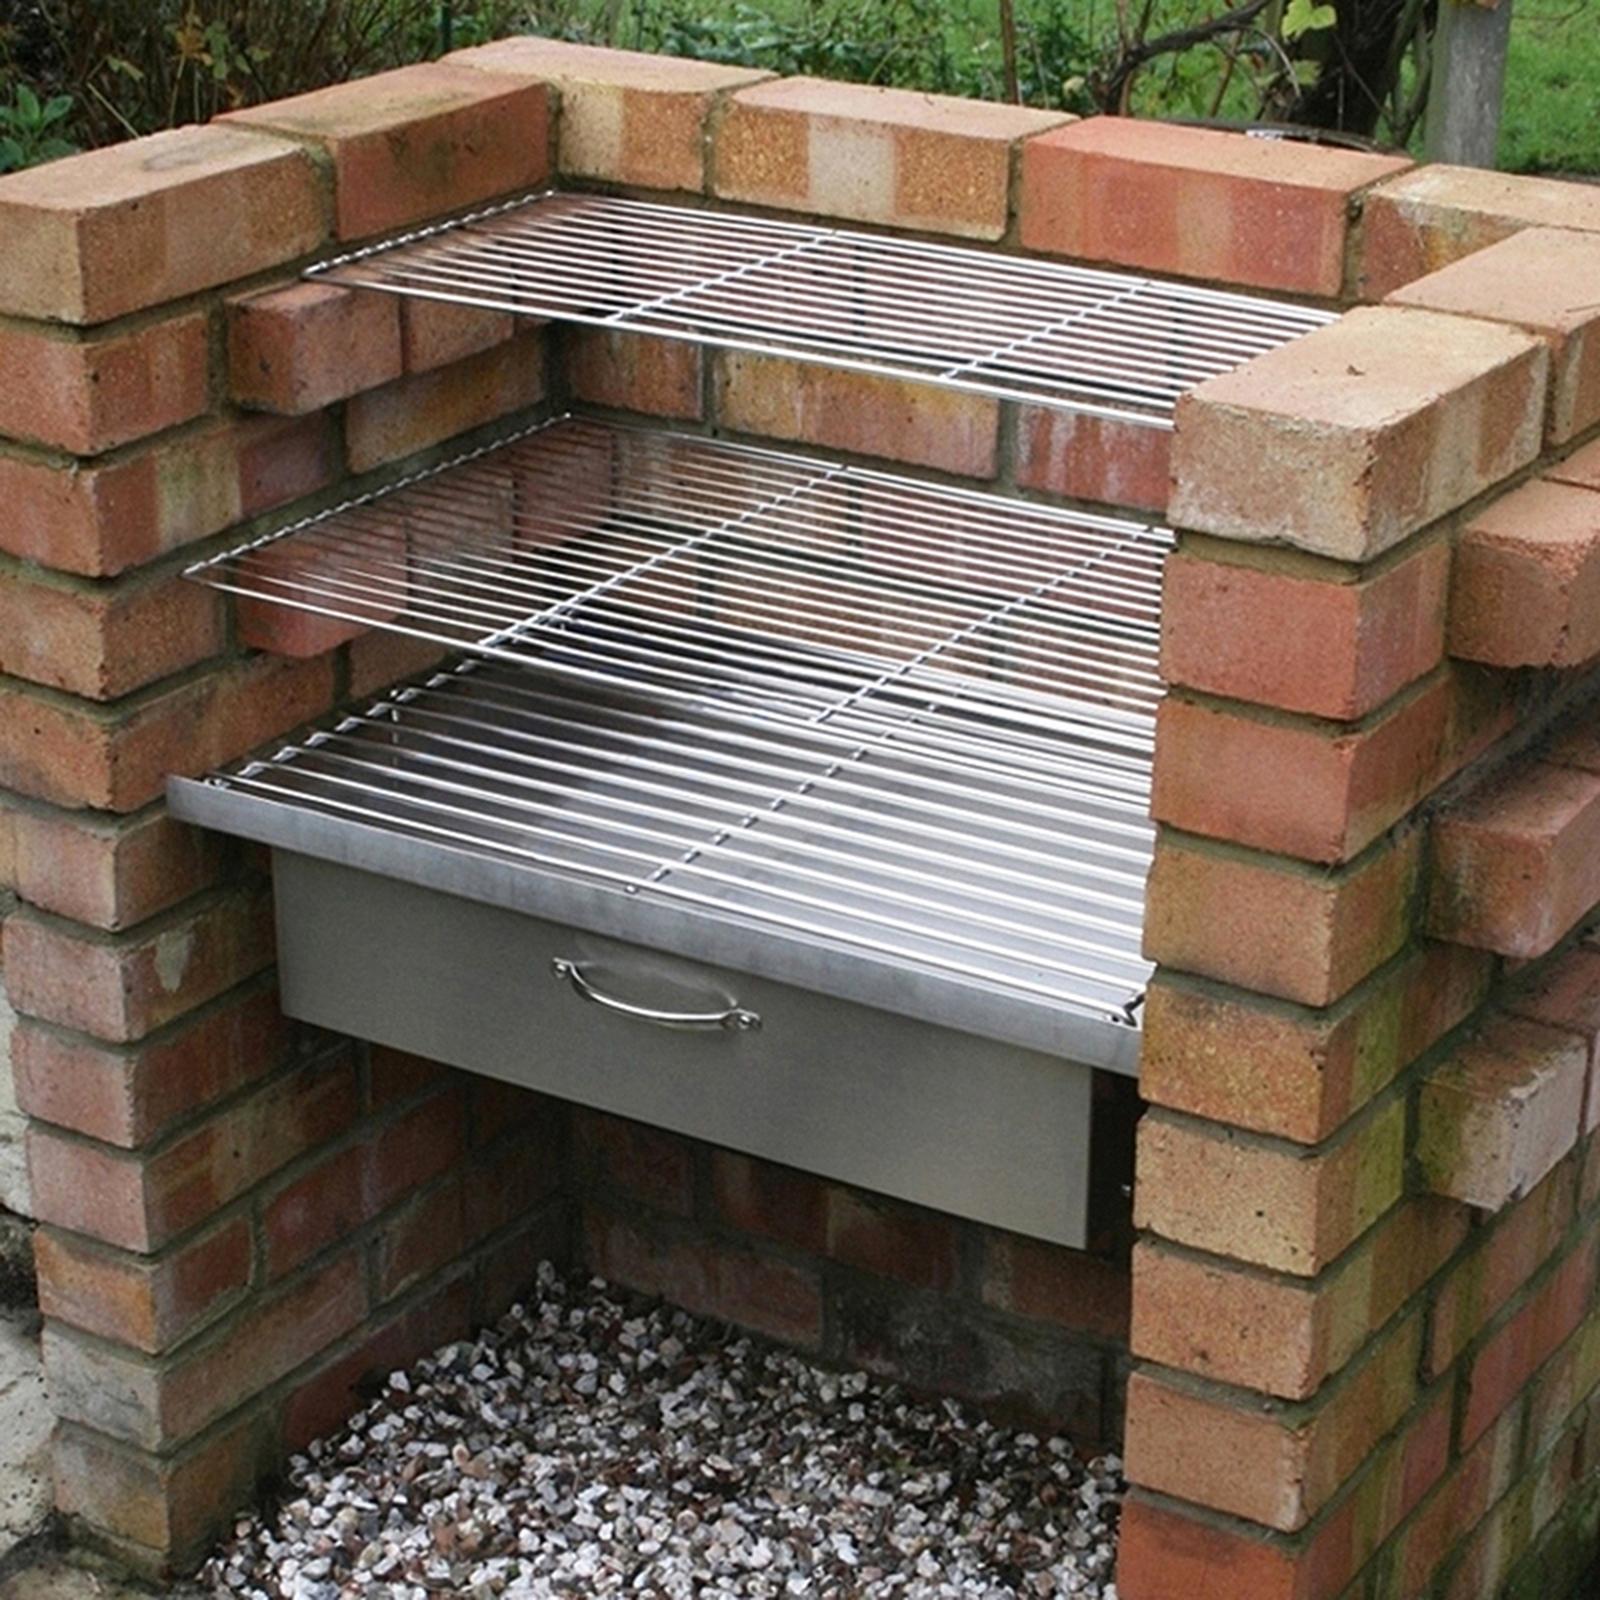 DIY Brick BBQ System - Complete Set, Grills, Warming Draw ...